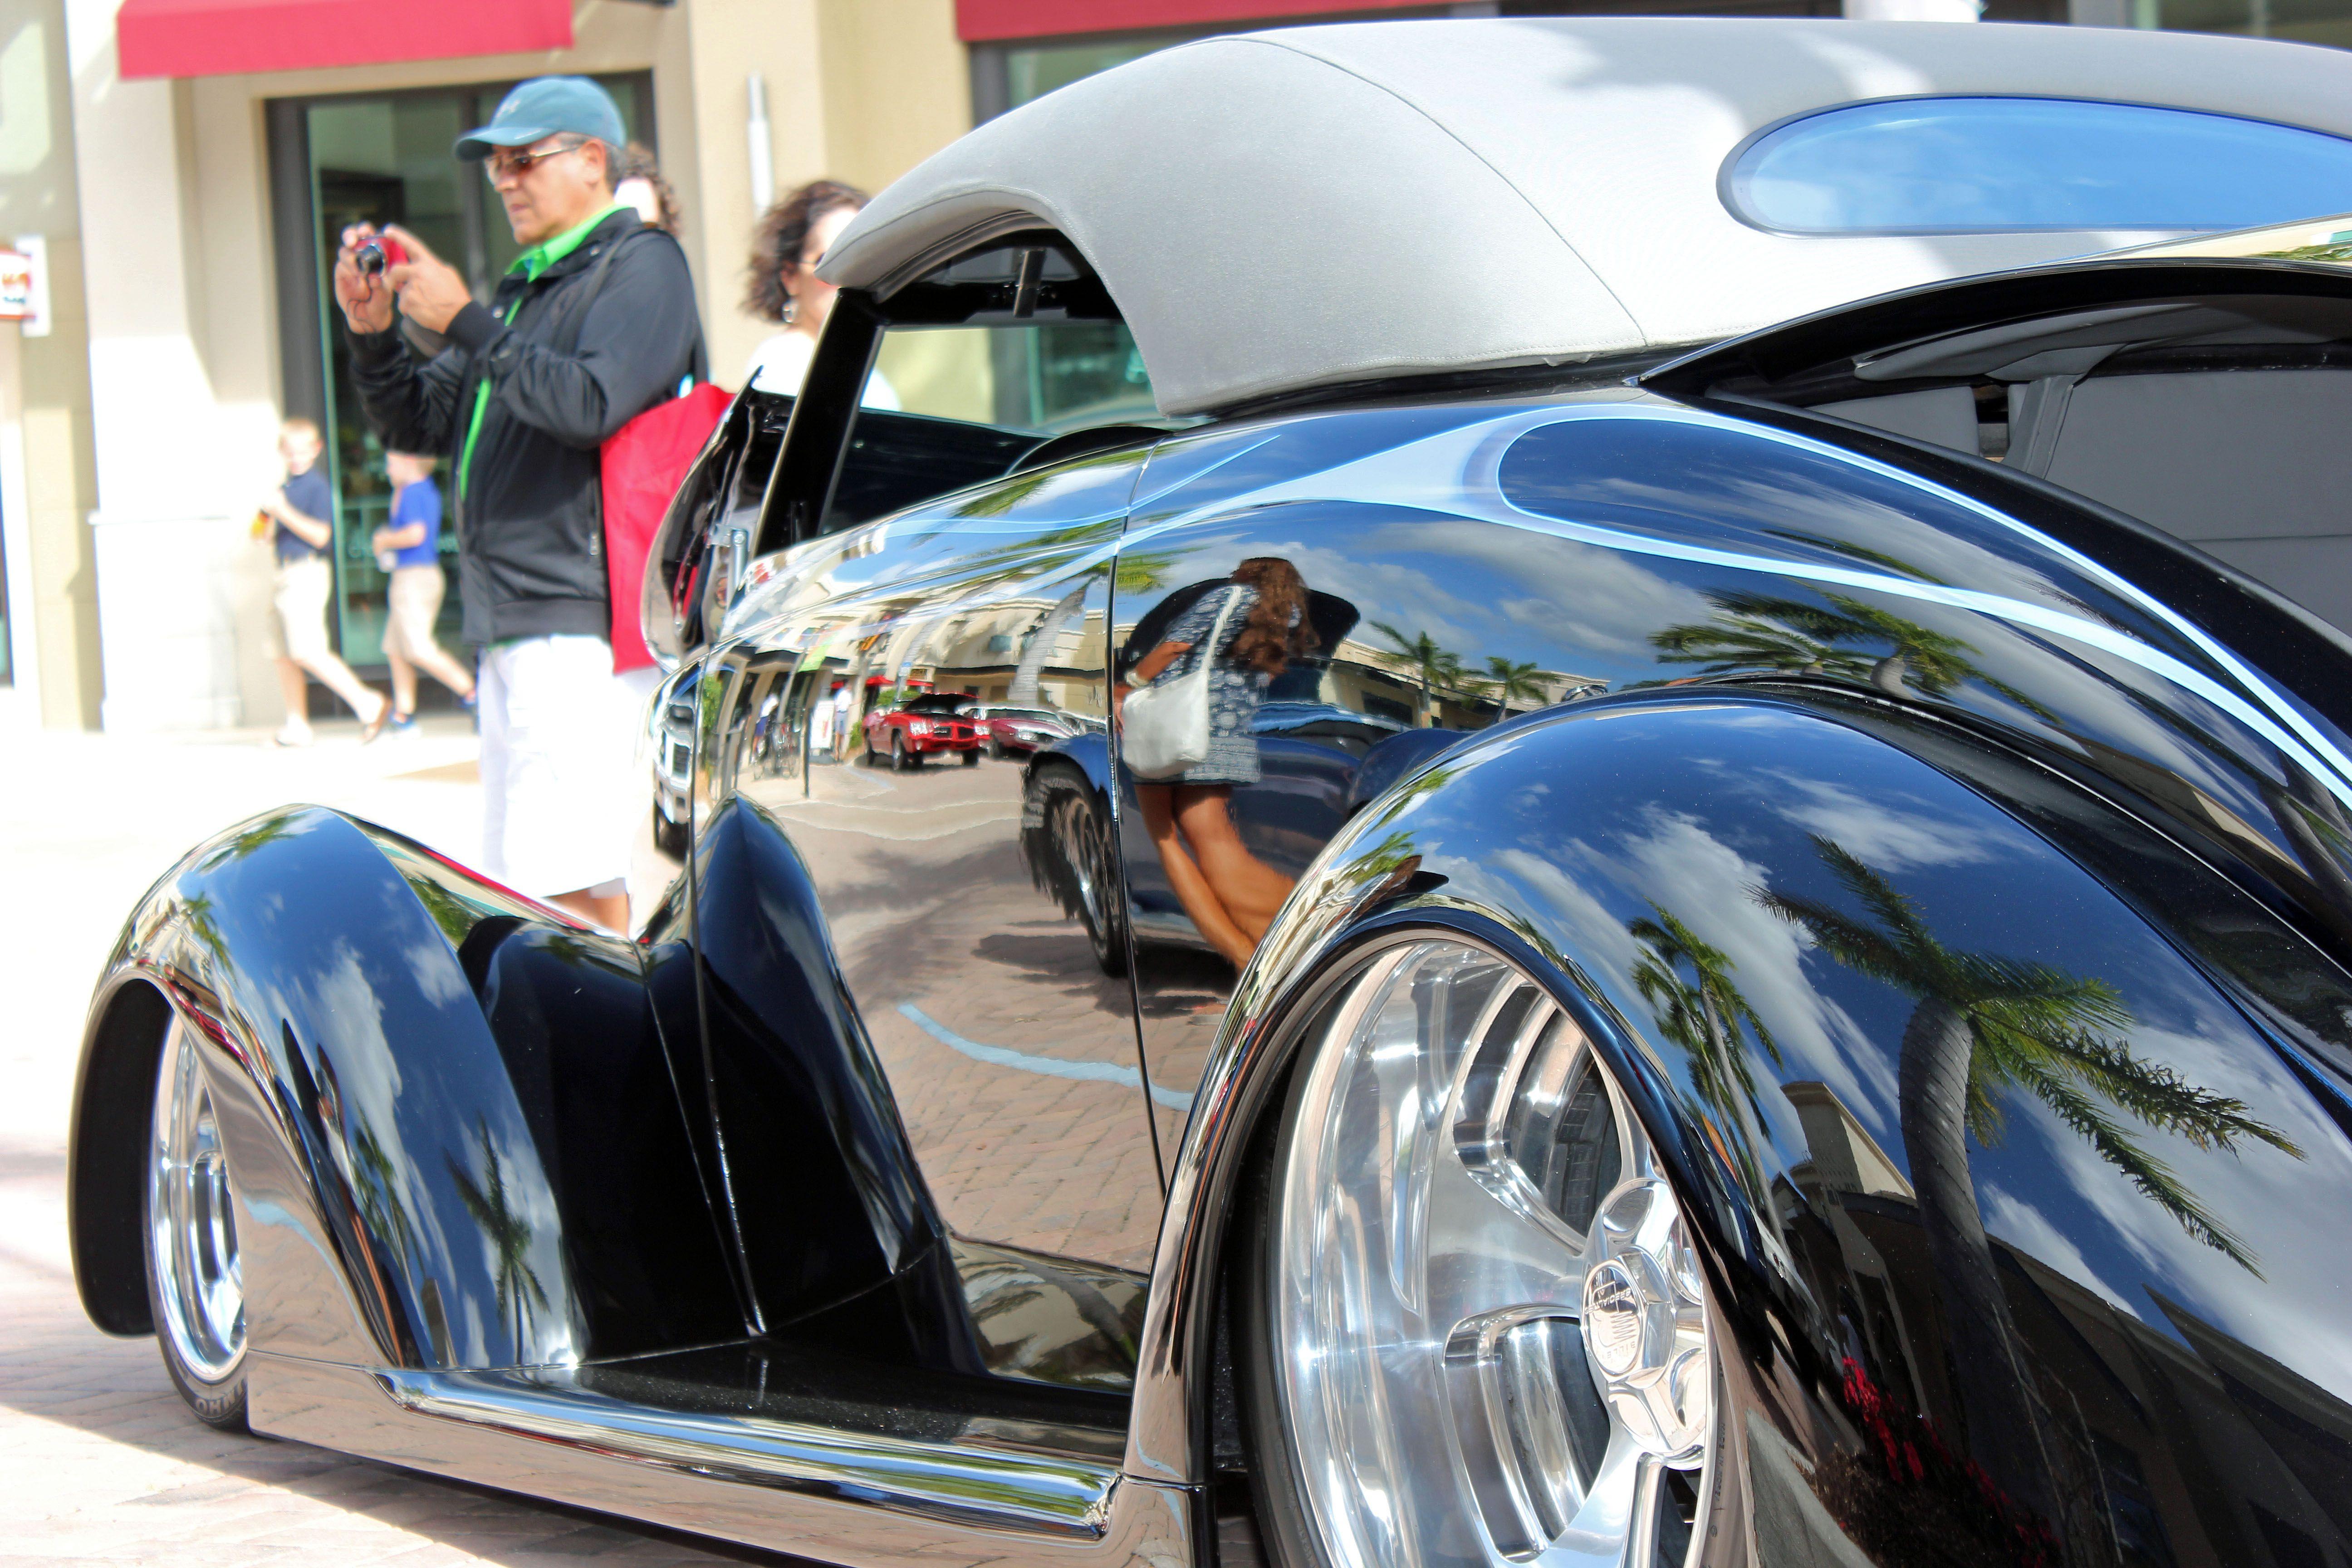 Mercato Car Show Naples FL American Classic Cars Pinterest - Mercato car show